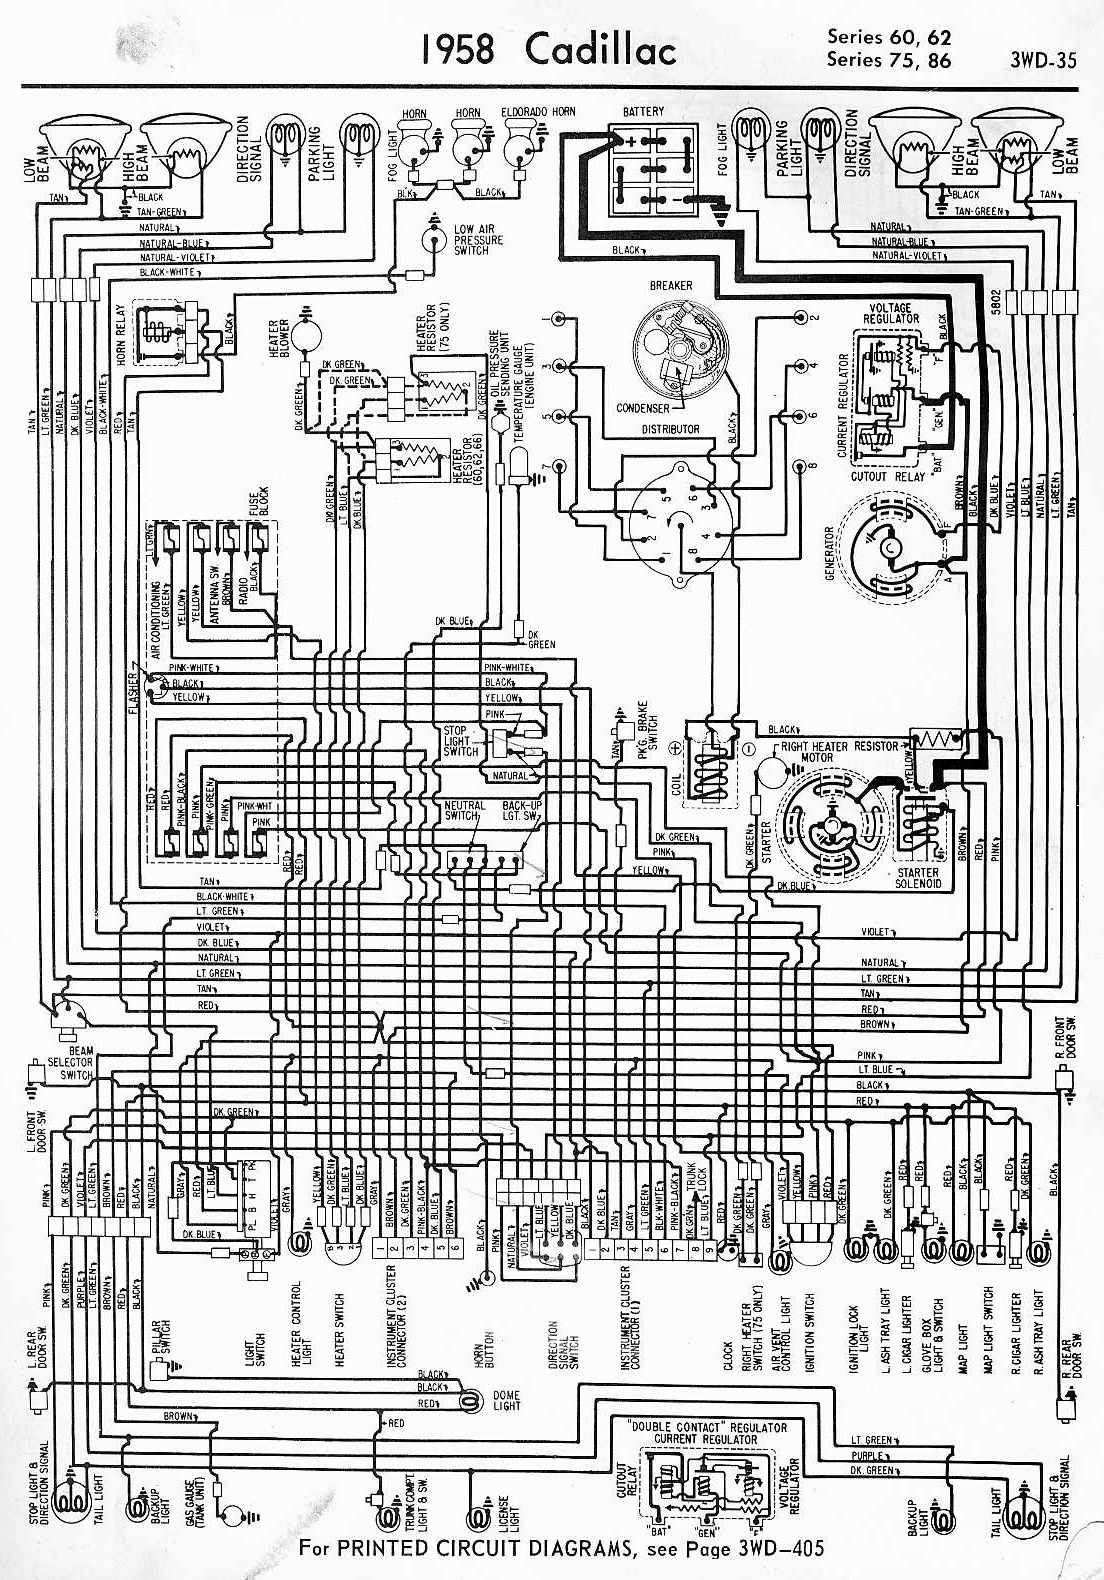 1957 Corvette Wiring Diagram Just Another Blog 1967 Schematic Cadillac Free Download Diagrams Rh 71 Jessicadonath De Starter